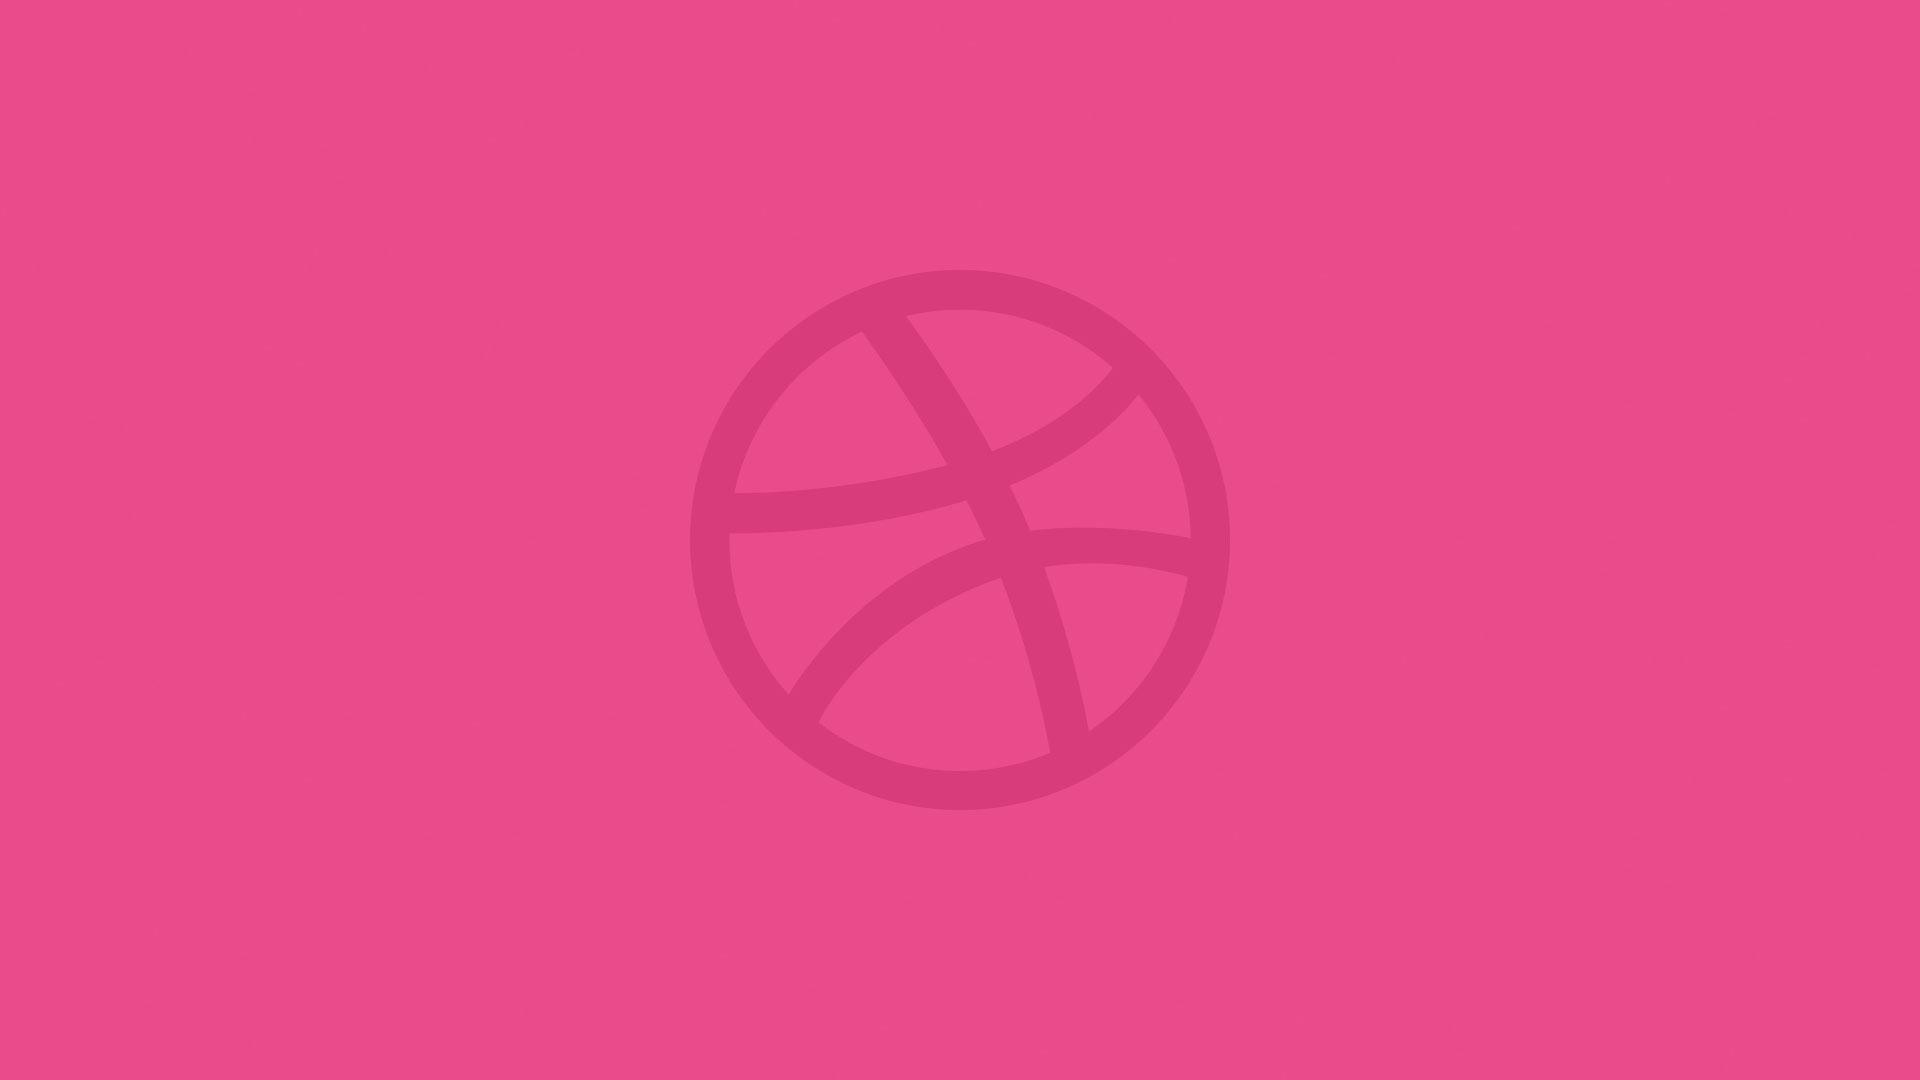 http://www.thisisalyssalee.com/wp-content/uploads/2016/09/header-dribbble.jpg